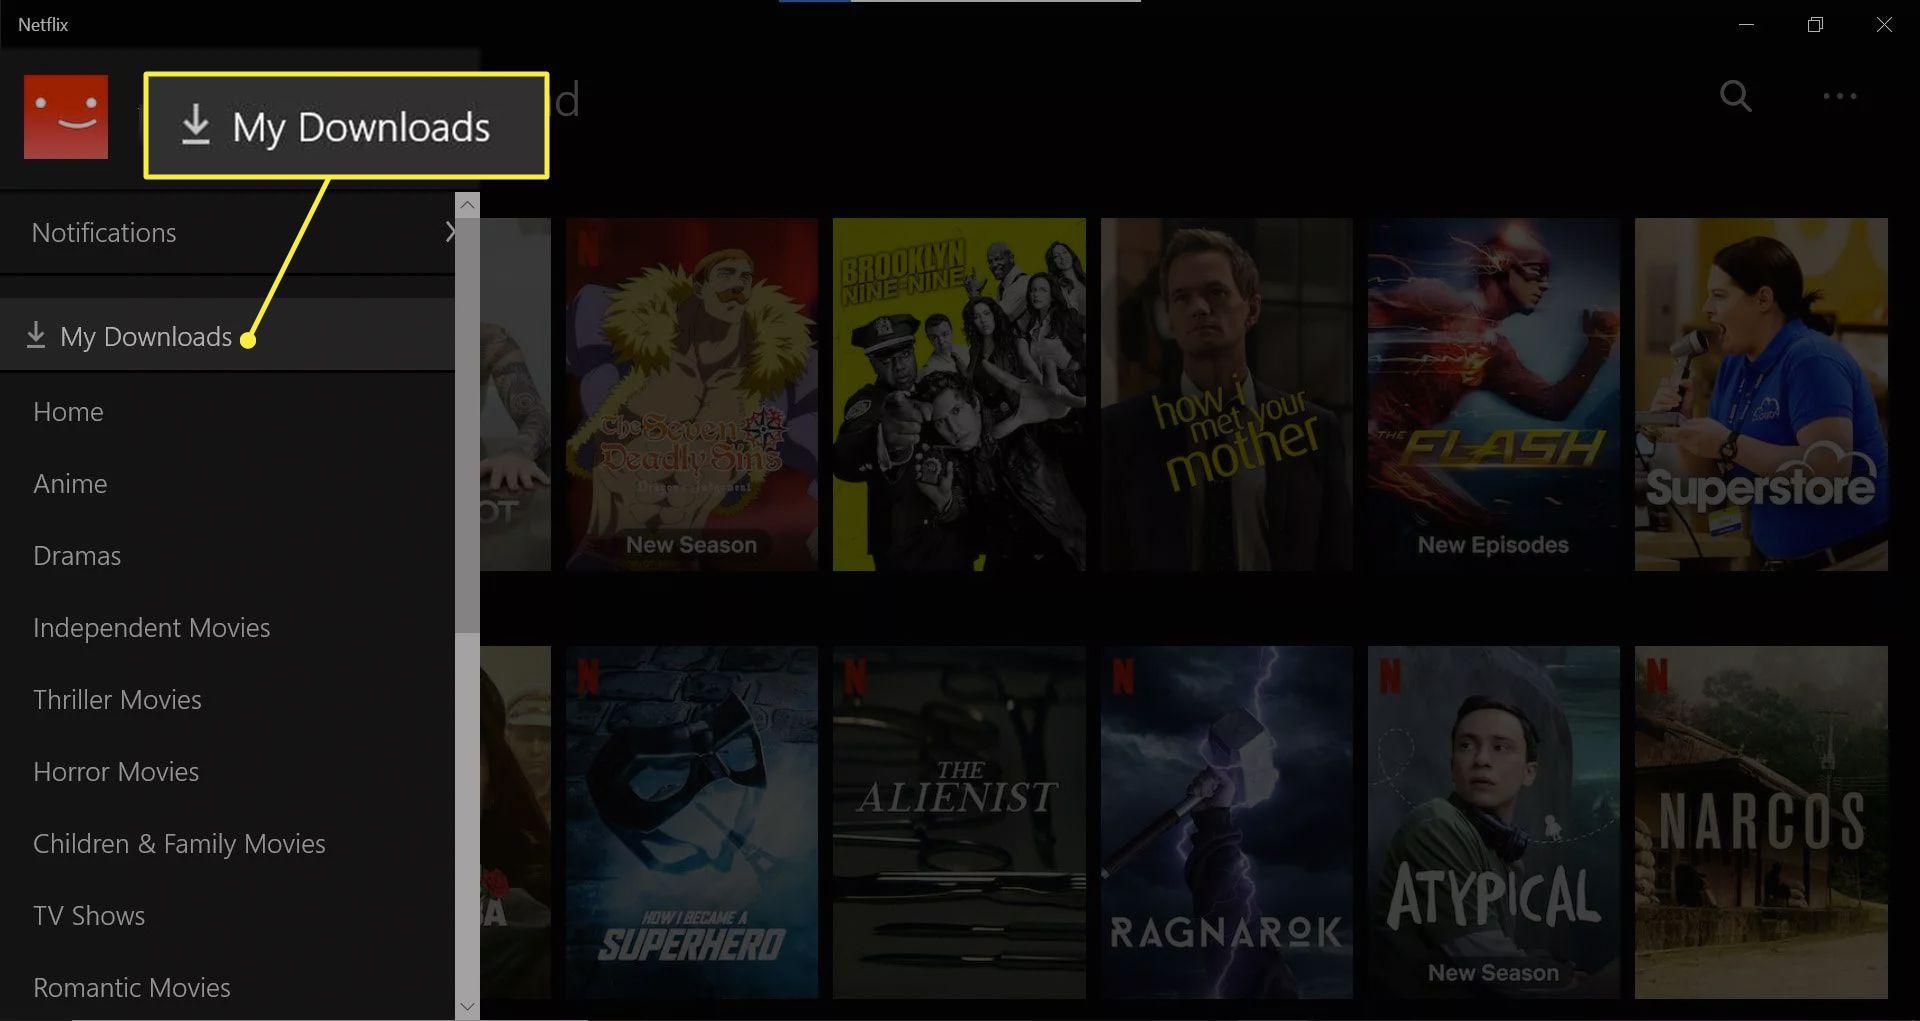 Accessing My Downloads in Netflix Windows app.